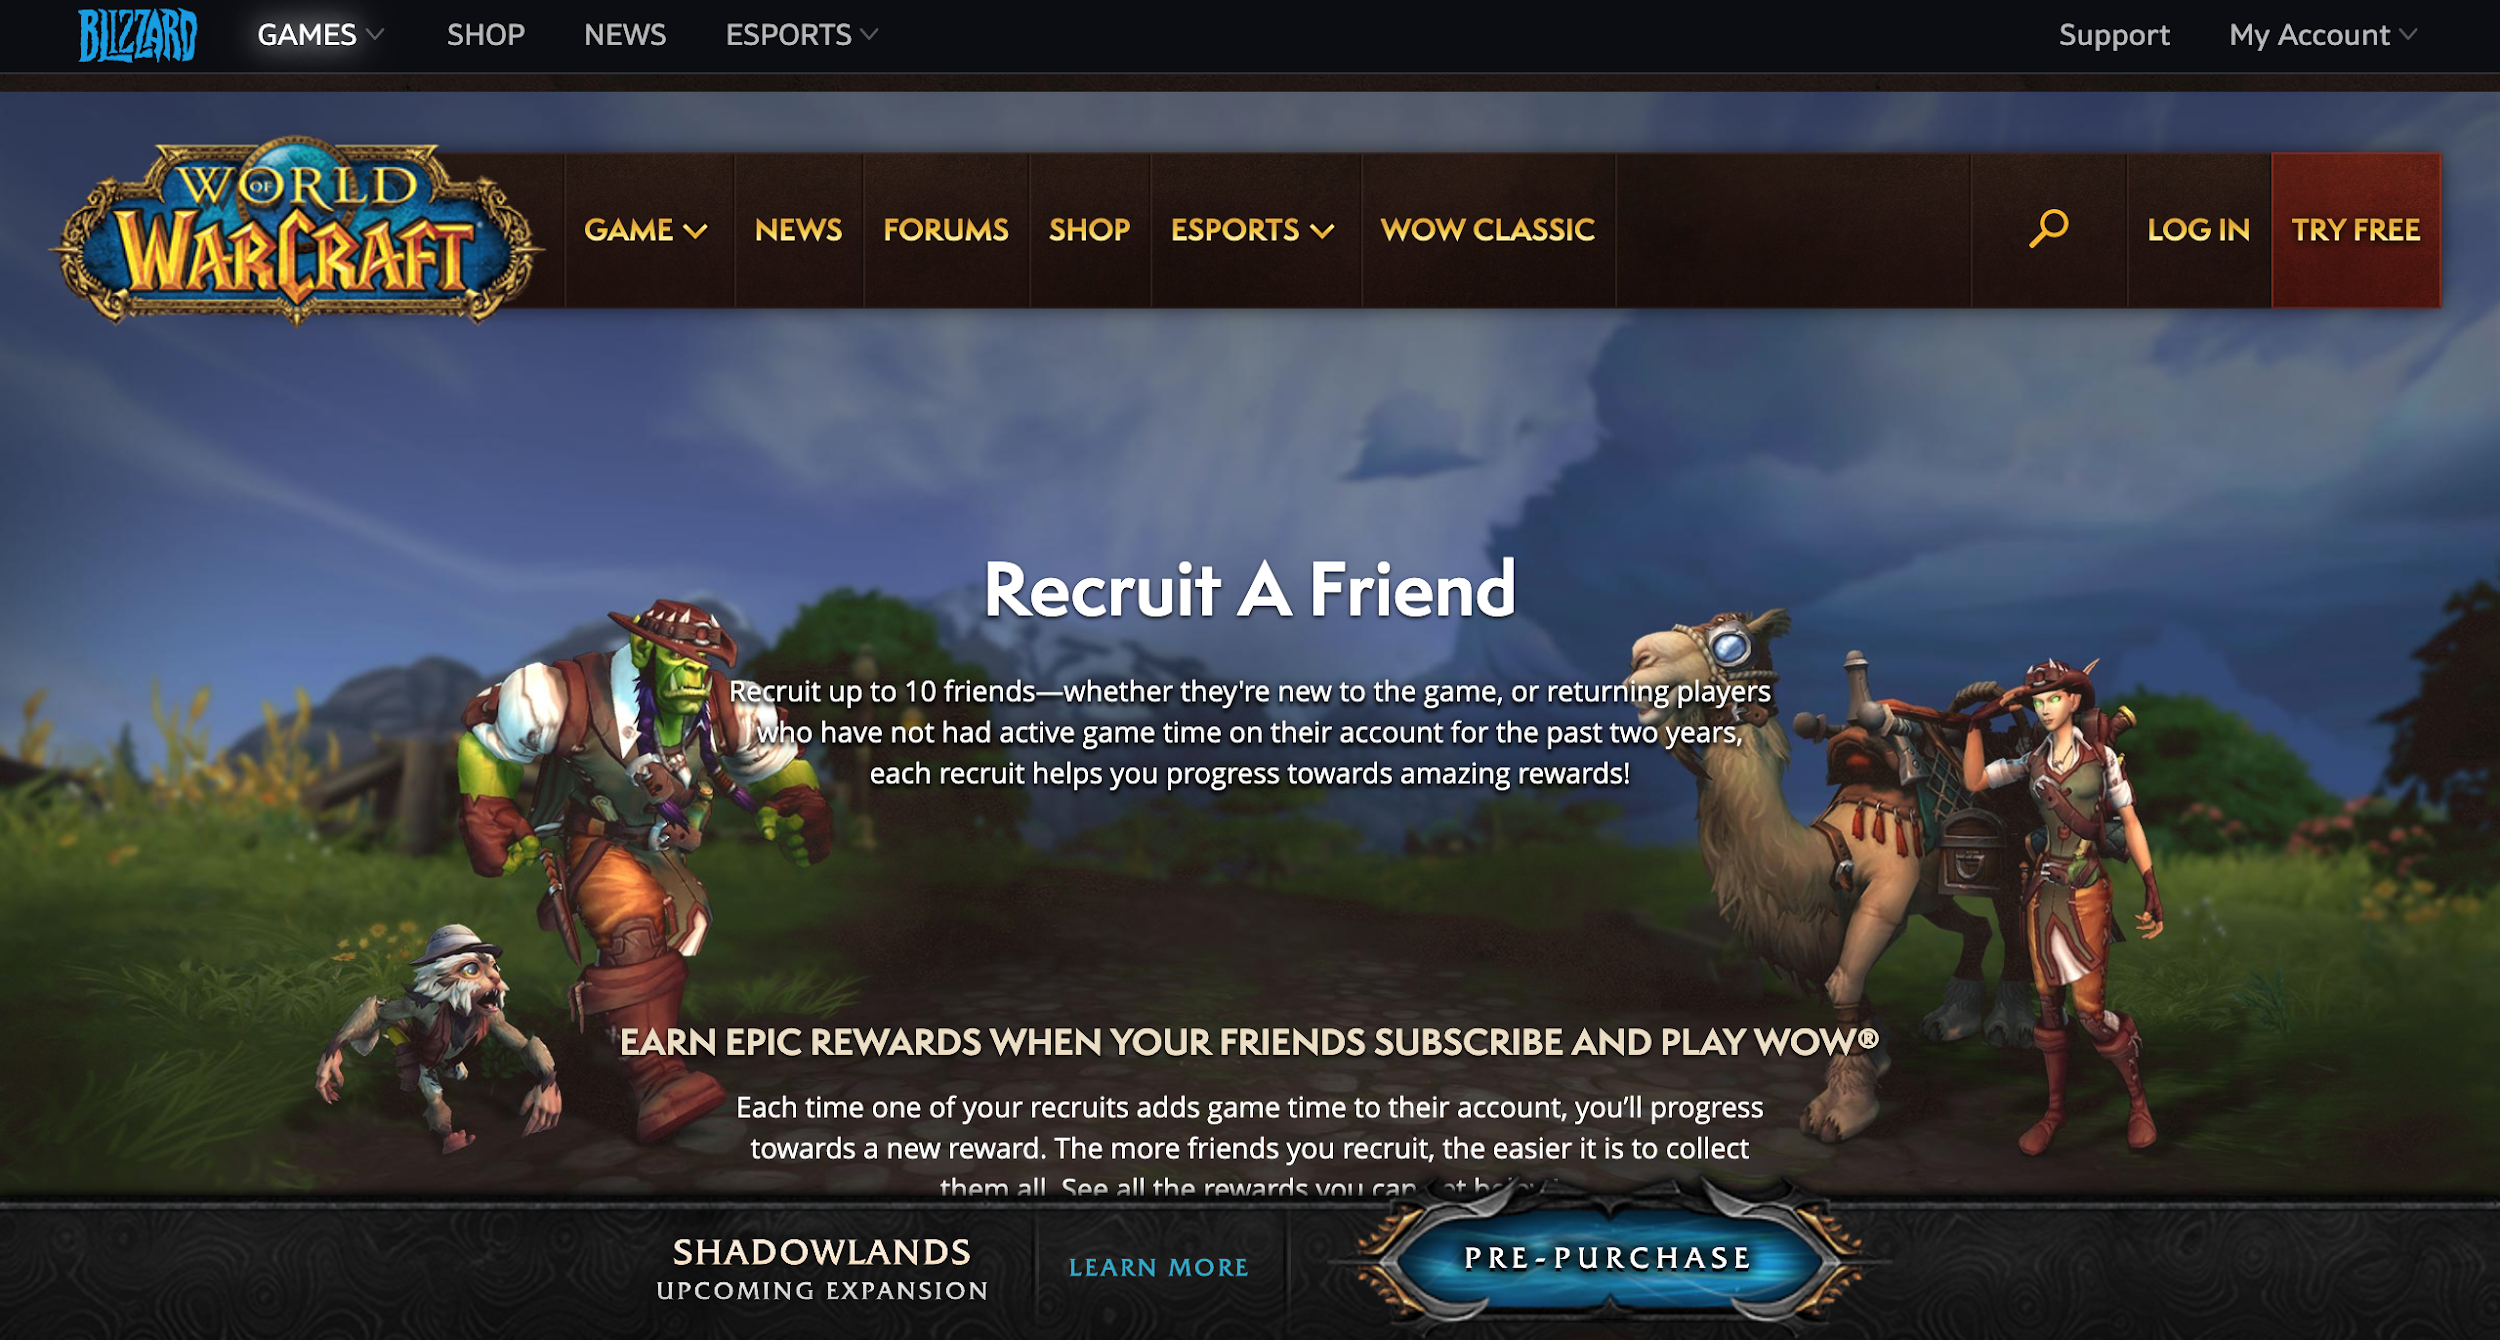 World of Warcraft Referral Program